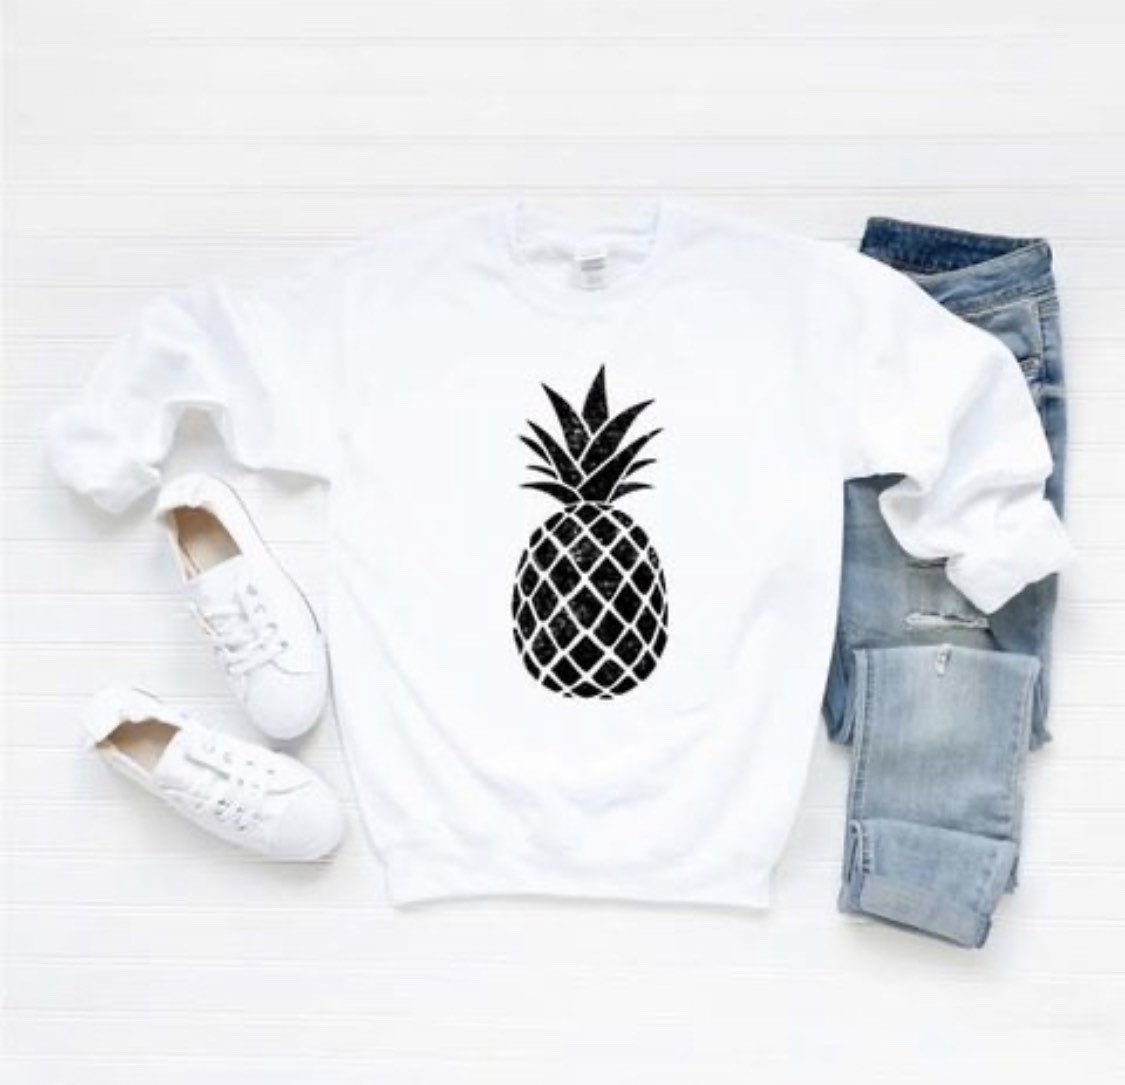 Pineapple Sweatshirt Sweatshirts Pineapple Sweatshirt Sweatshirts Women [ 1085 x 1125 Pixel ]